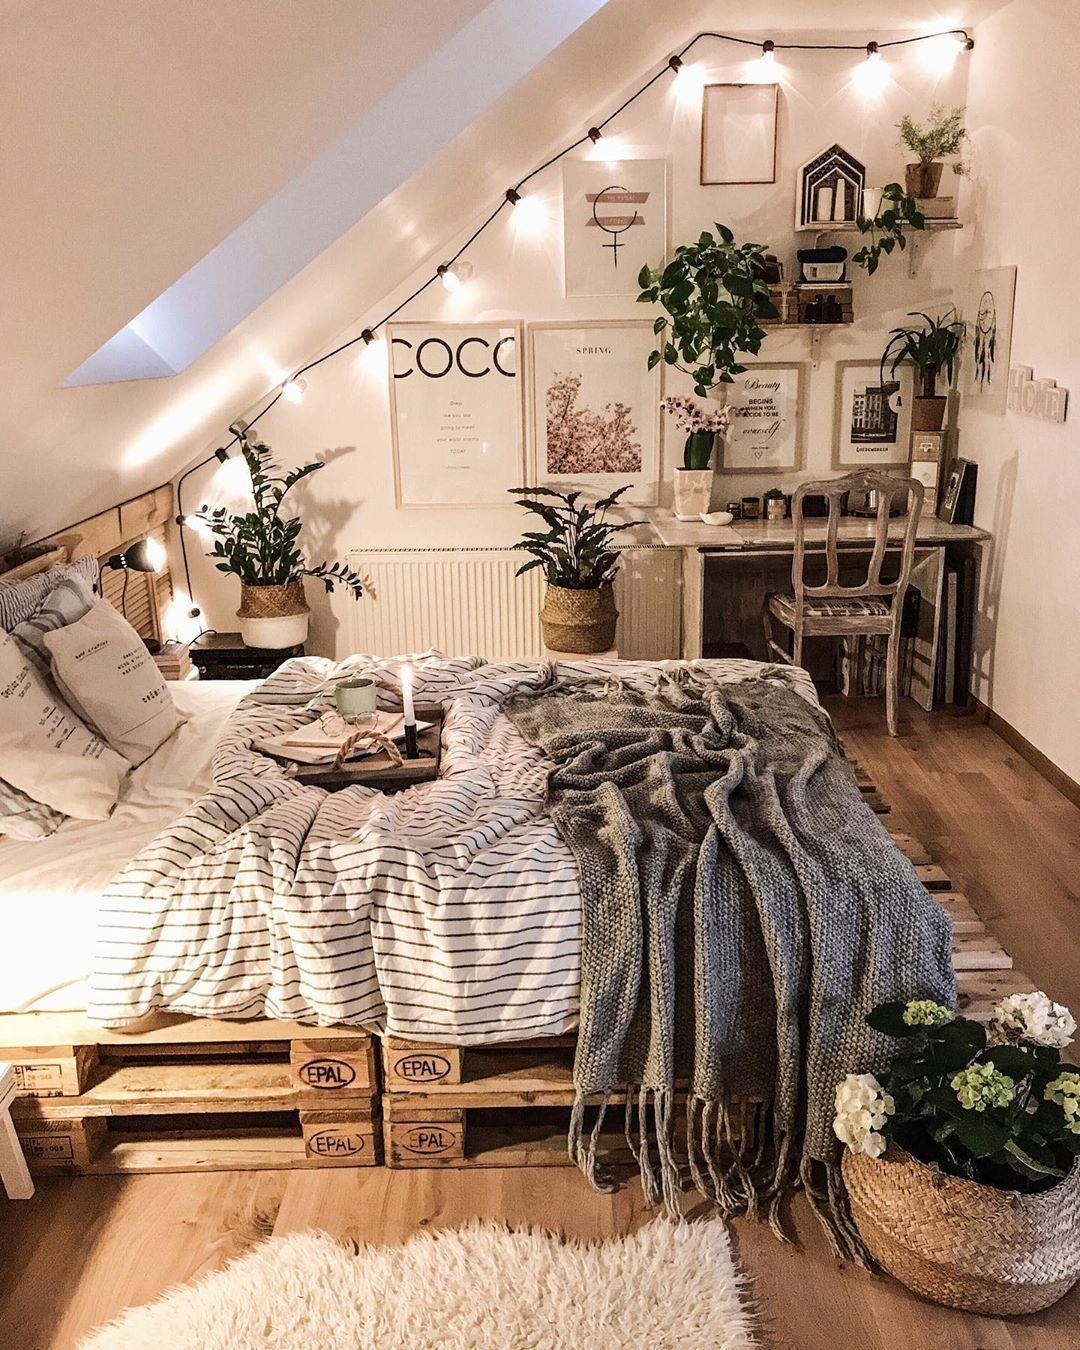 Home Interior Design Pallet Bed In A Cozy Room Poland Deco